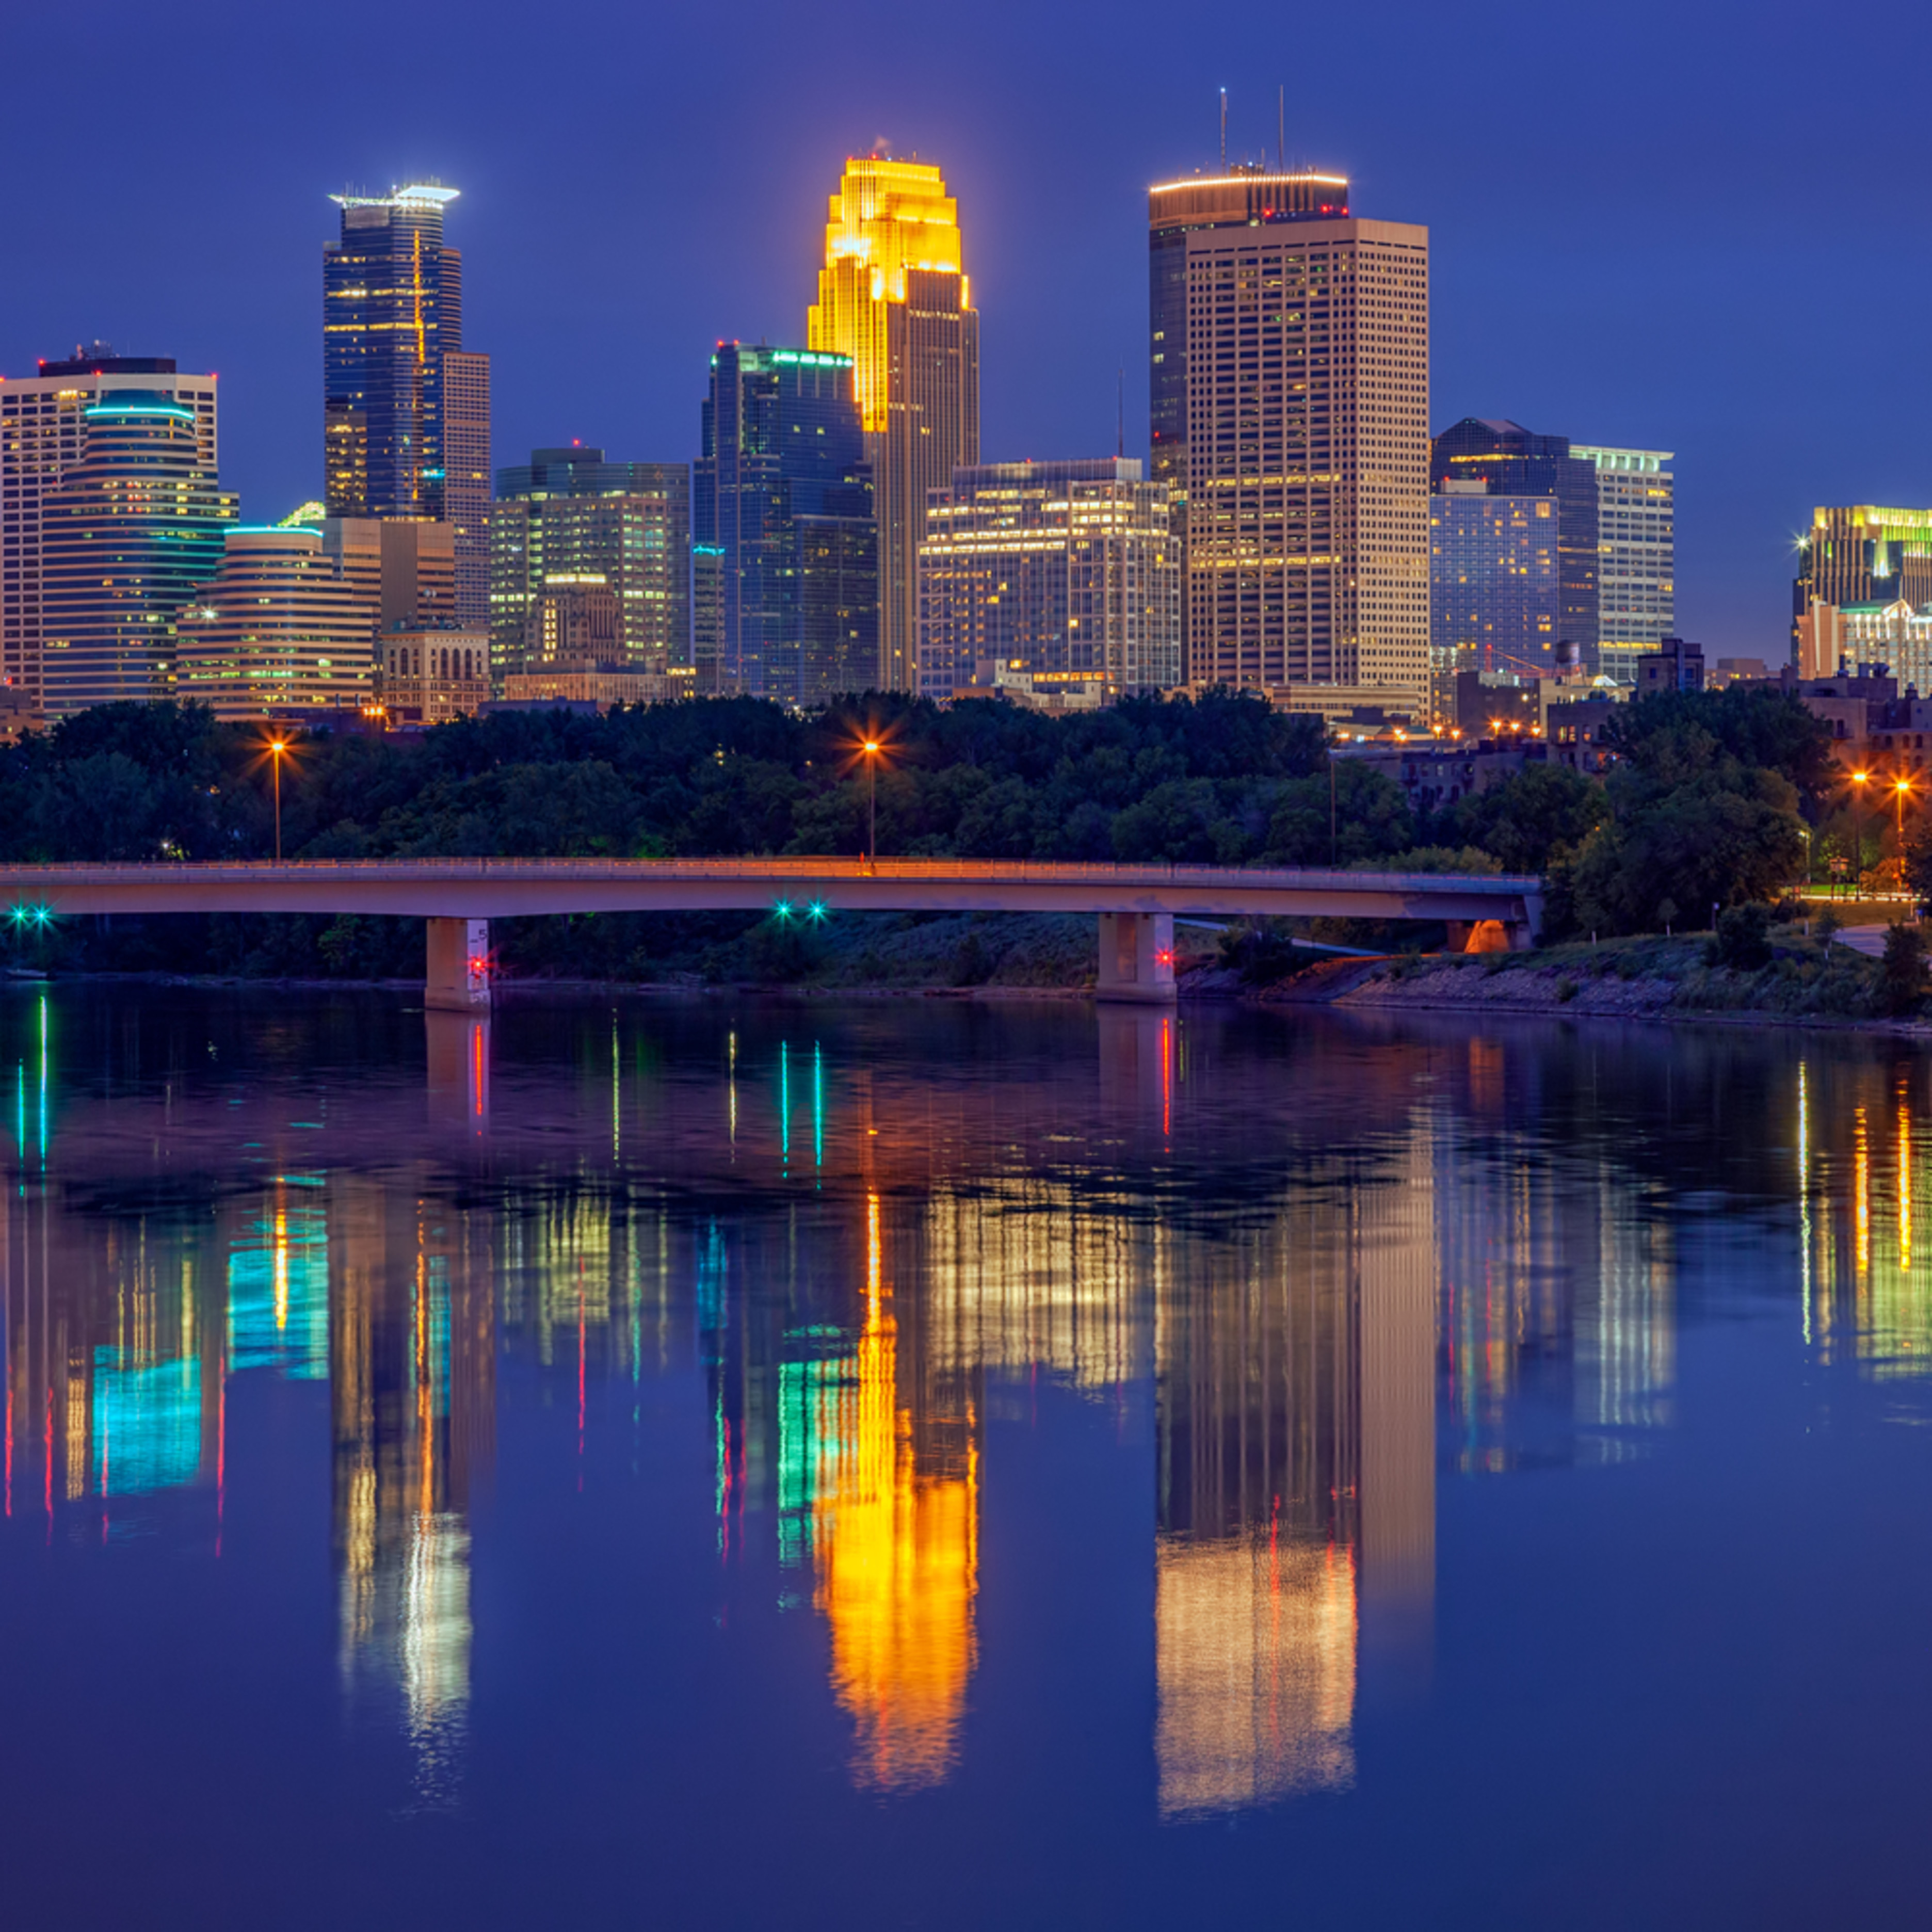 Minneapolis 06 13 10 0011 2019 yi0vrr